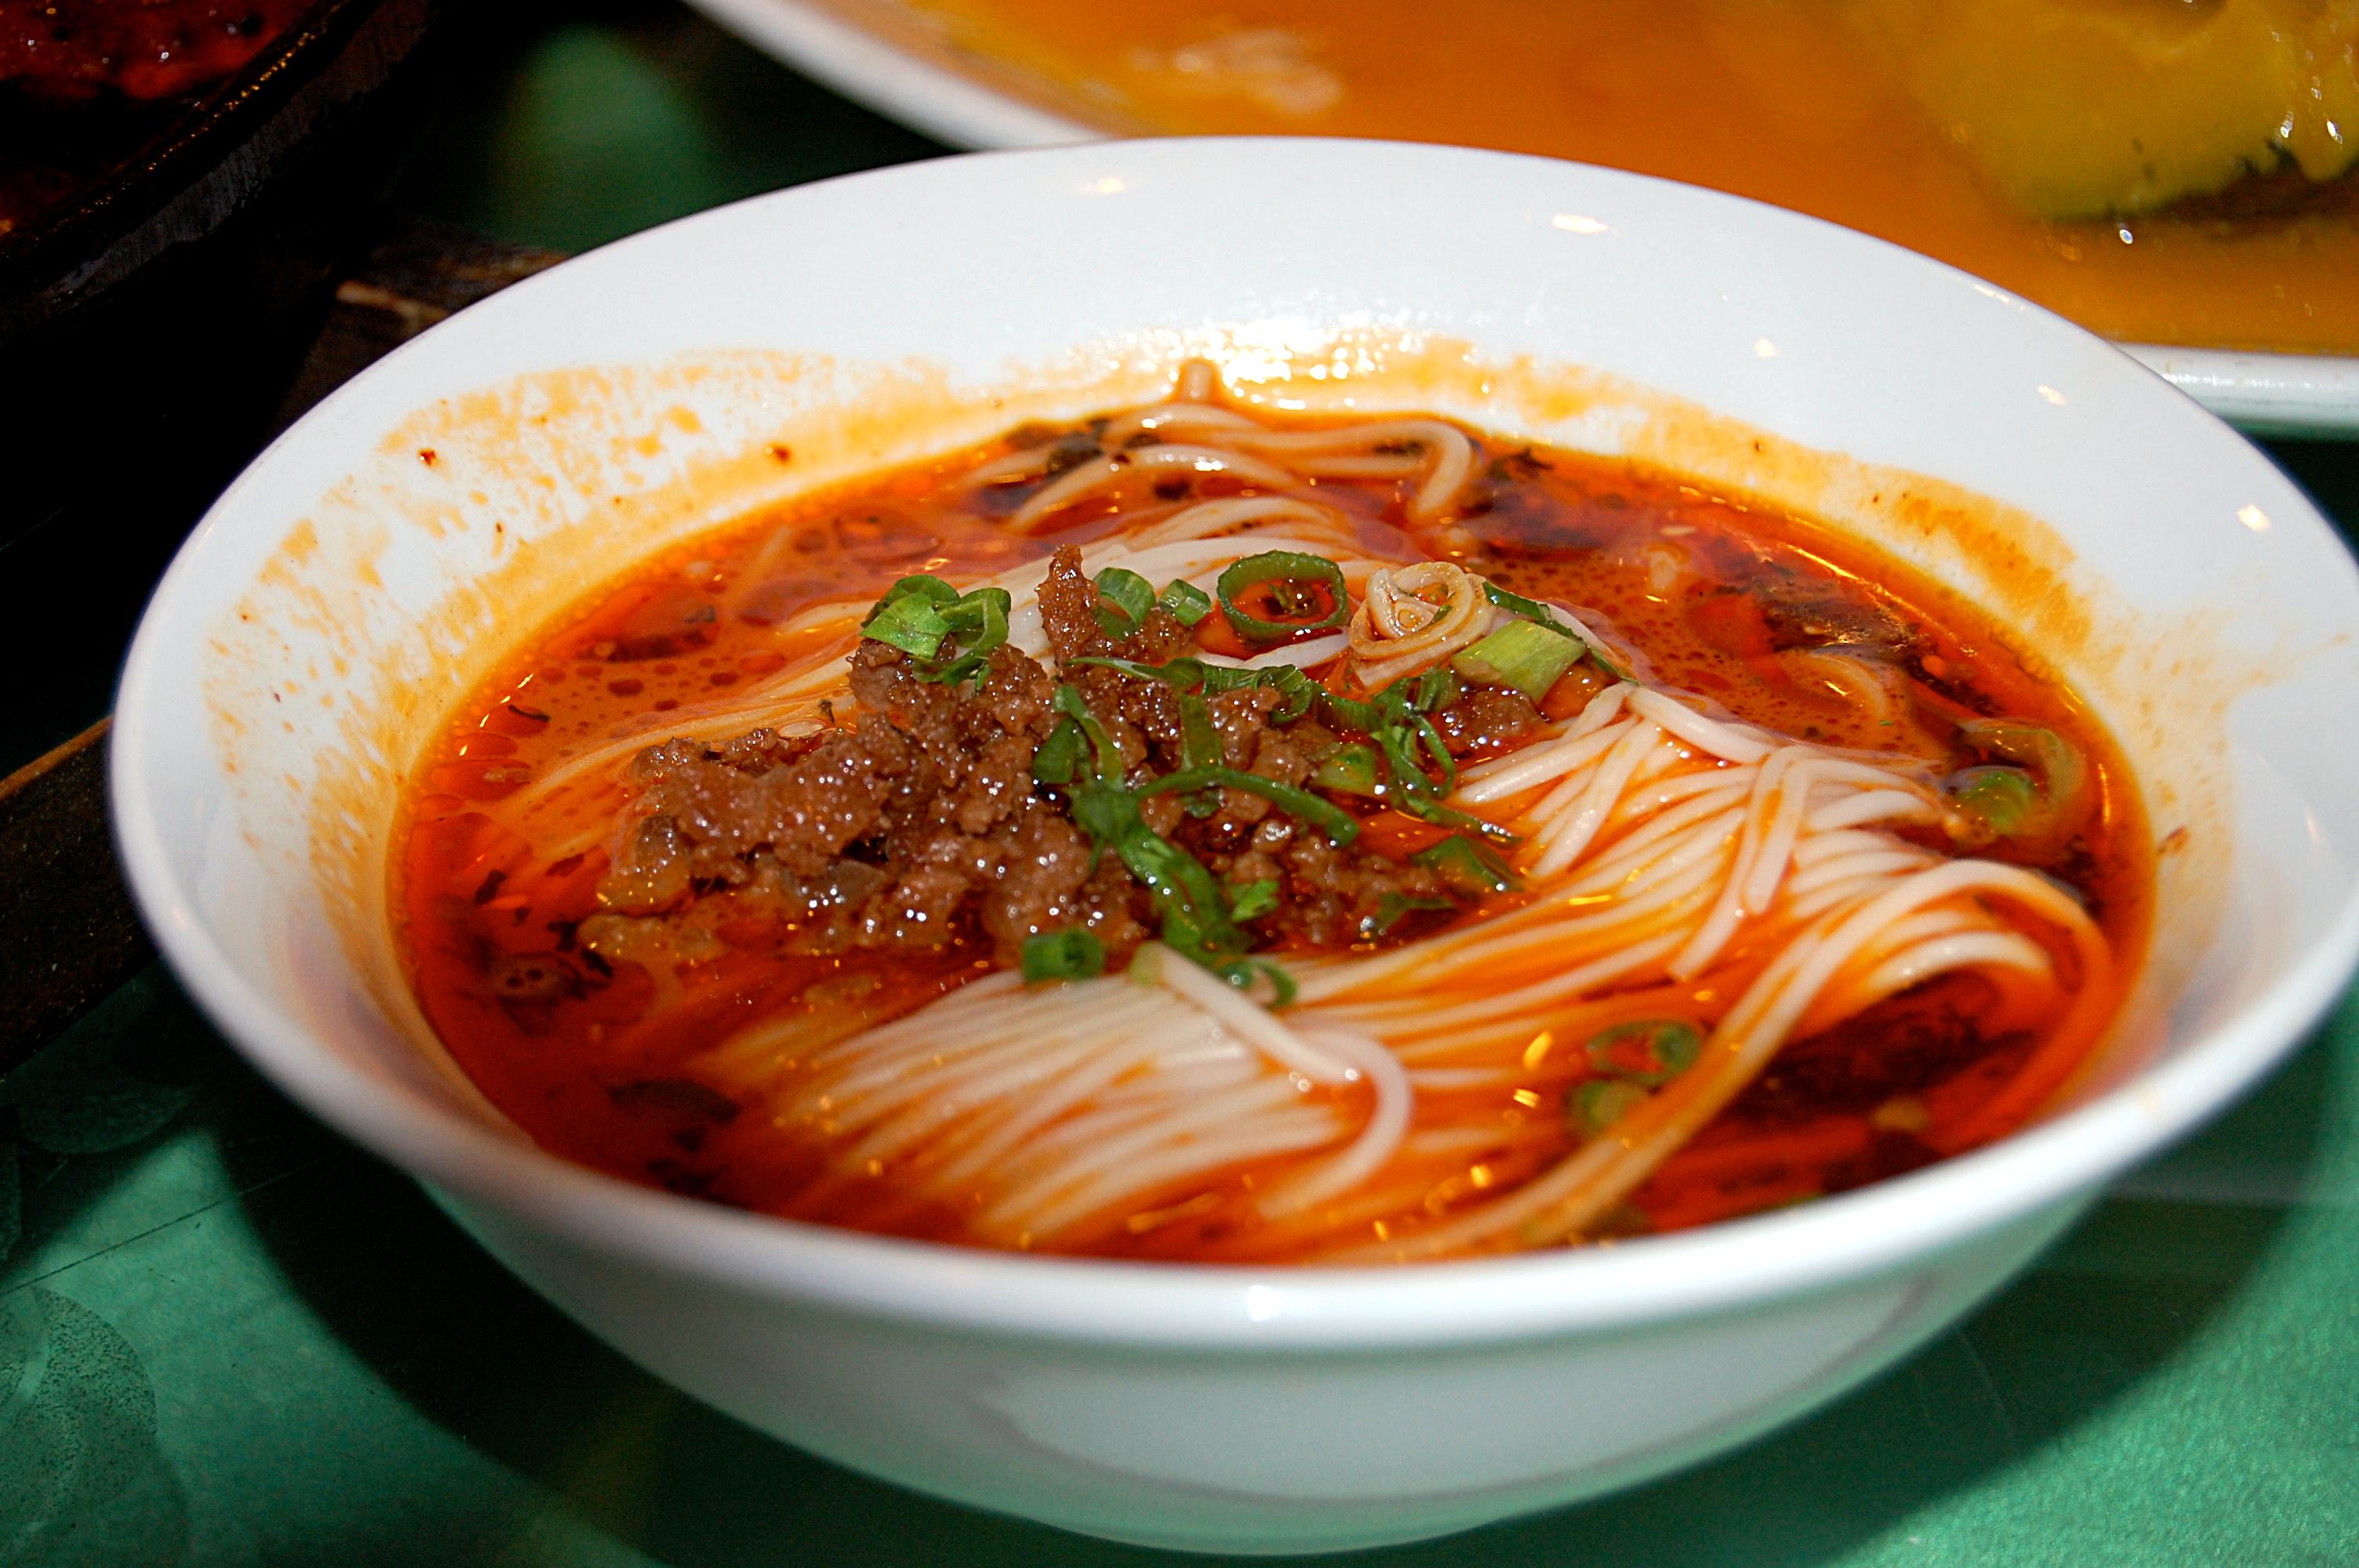 File:Dan-dan noodles, Shanghai.jpg - Wikipedia, the free encyclopedia